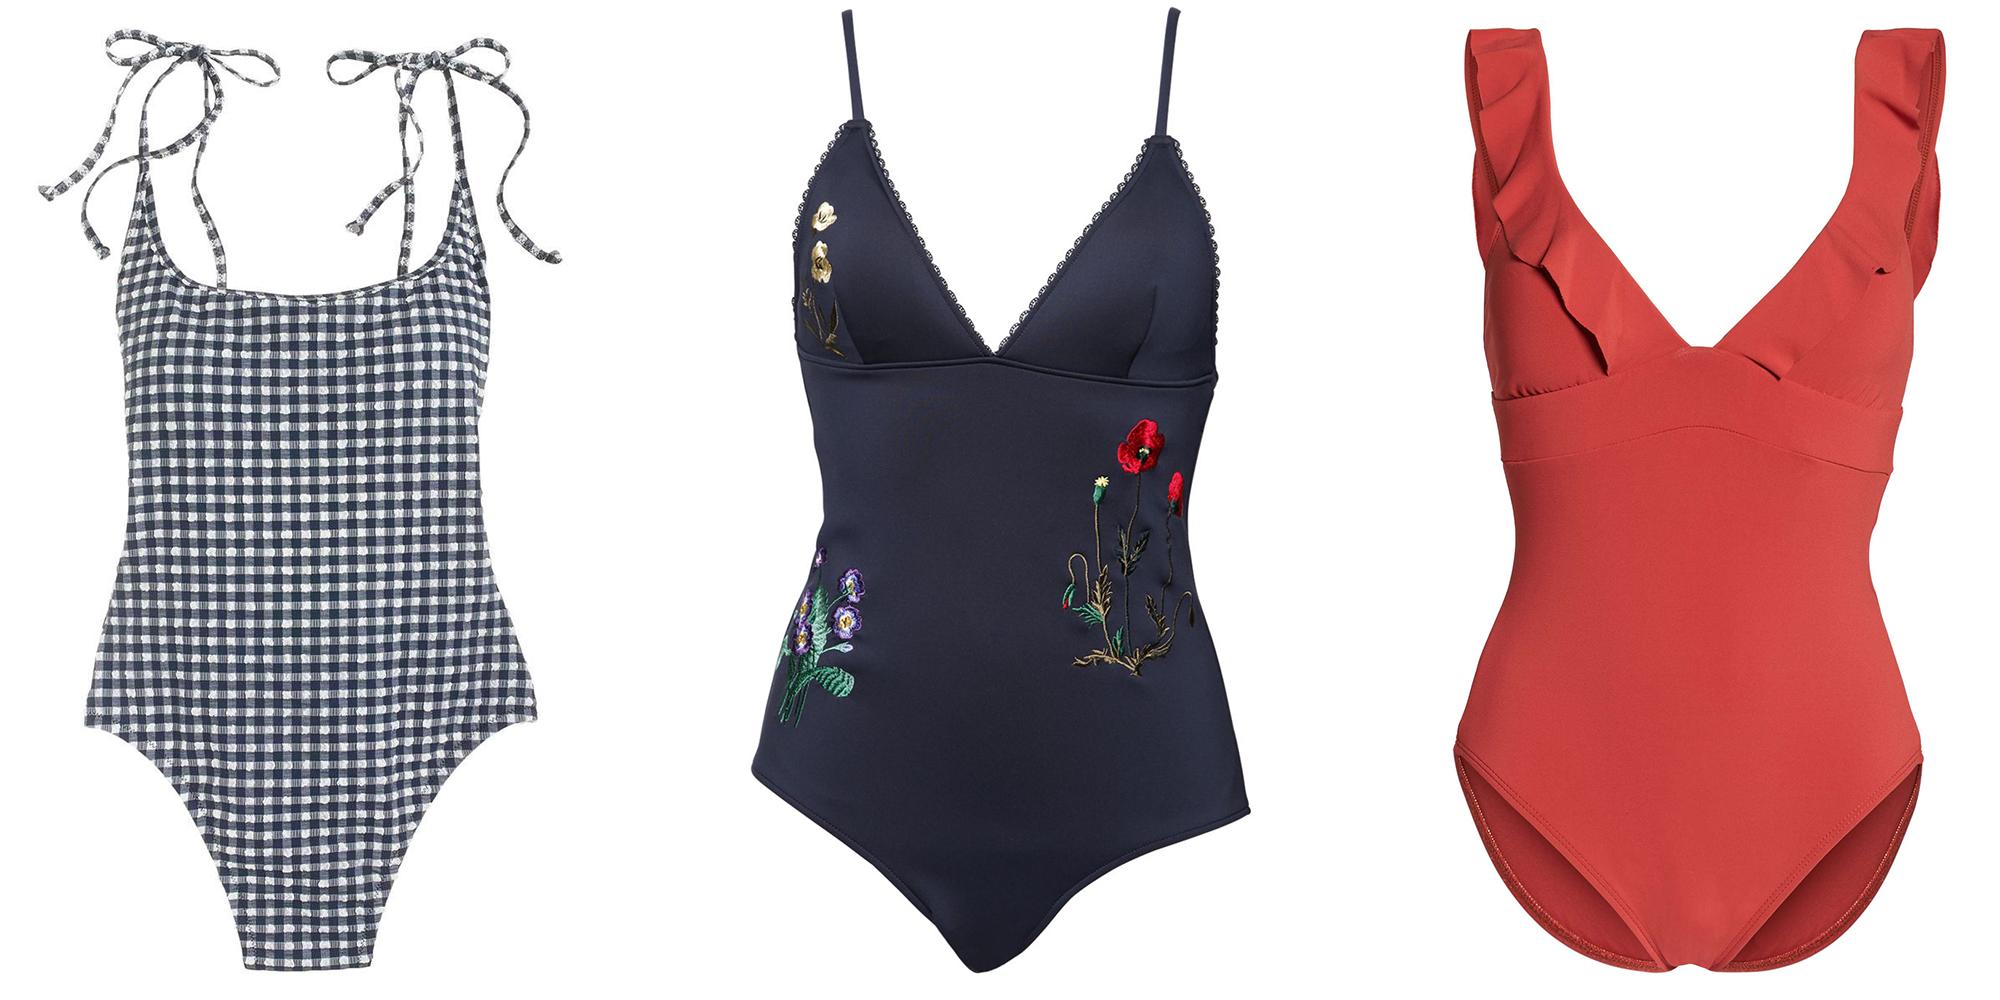 15 Best Swimsuits for Older Women